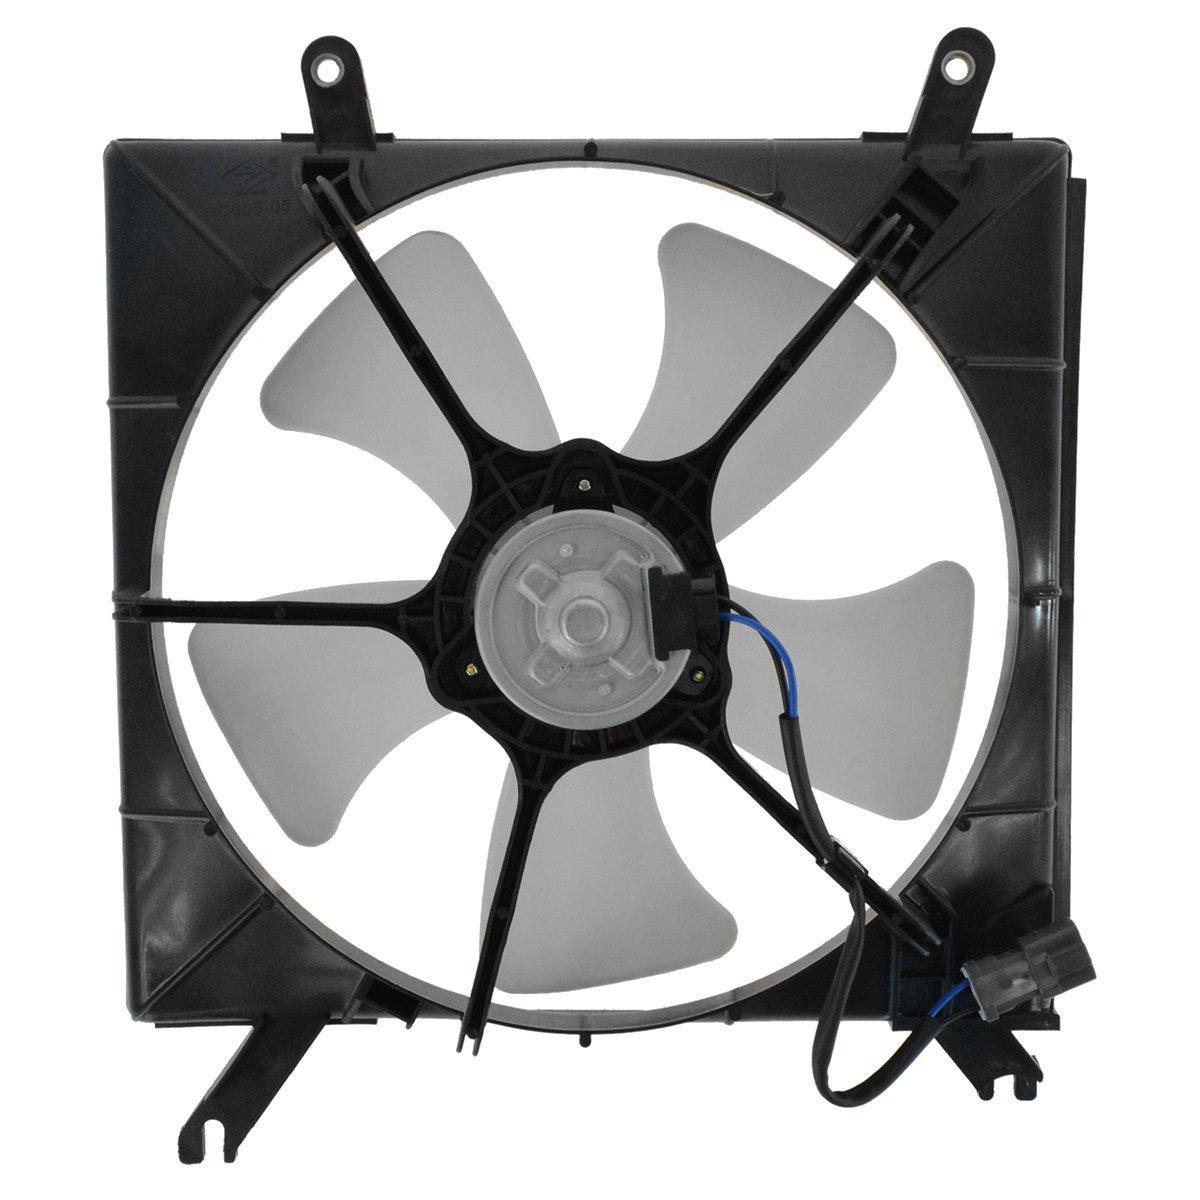 Radiator Cooling Fan /& Motor Assembly for 90-93 Honda Accord